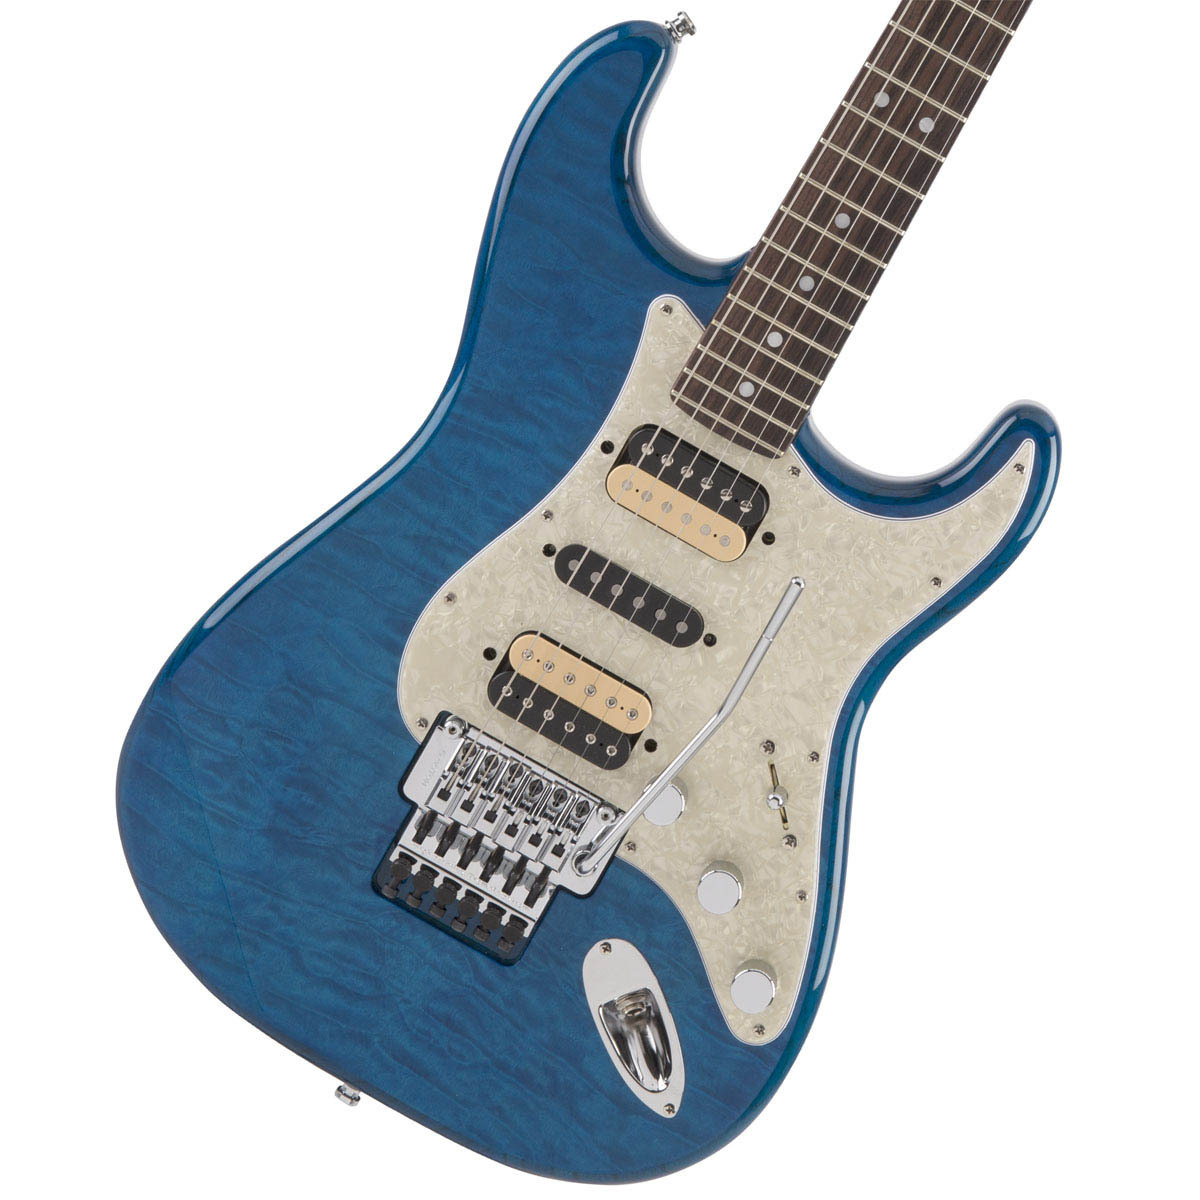 Fender / Michiya Haruhata Stratocaster Caribbean Blue Trans 春畑道哉モデル 【YRK】【新品特価】《純正ケーブル&ピック1ダースプレゼント!/+661944400》【未展示在庫有り】